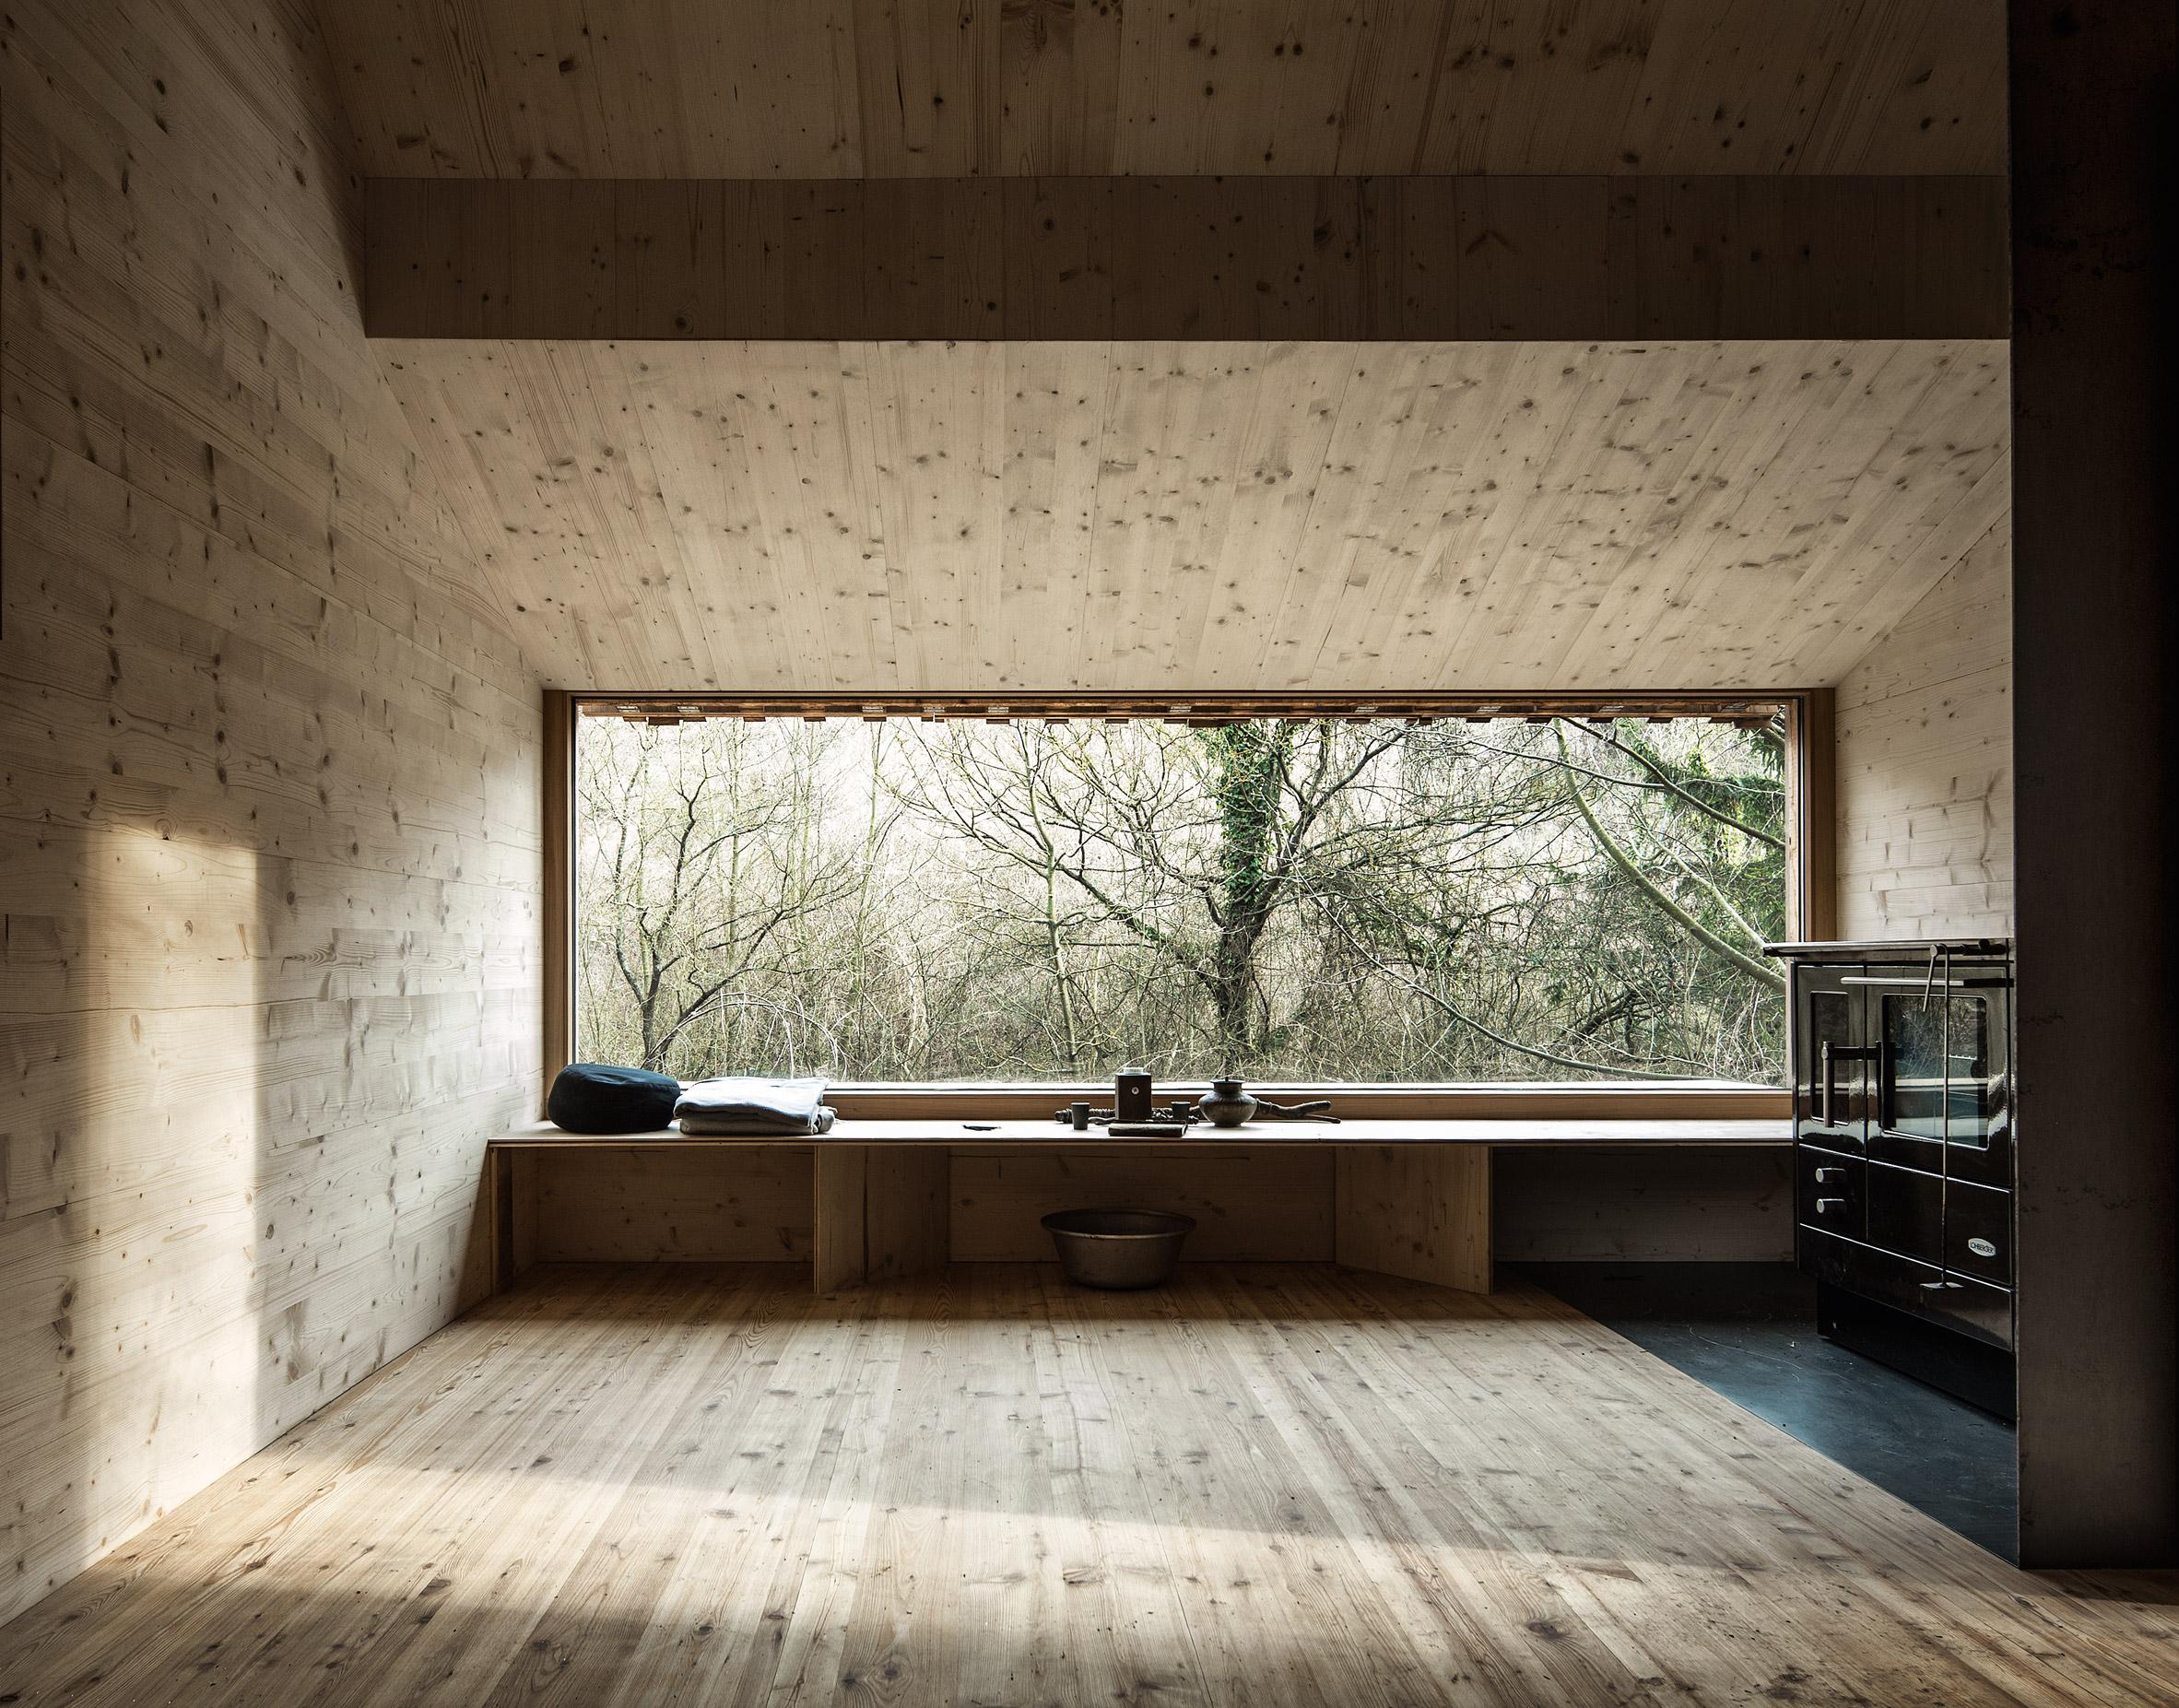 Raumhochrosen's woodland cabin in Austria provides respite for a life coach